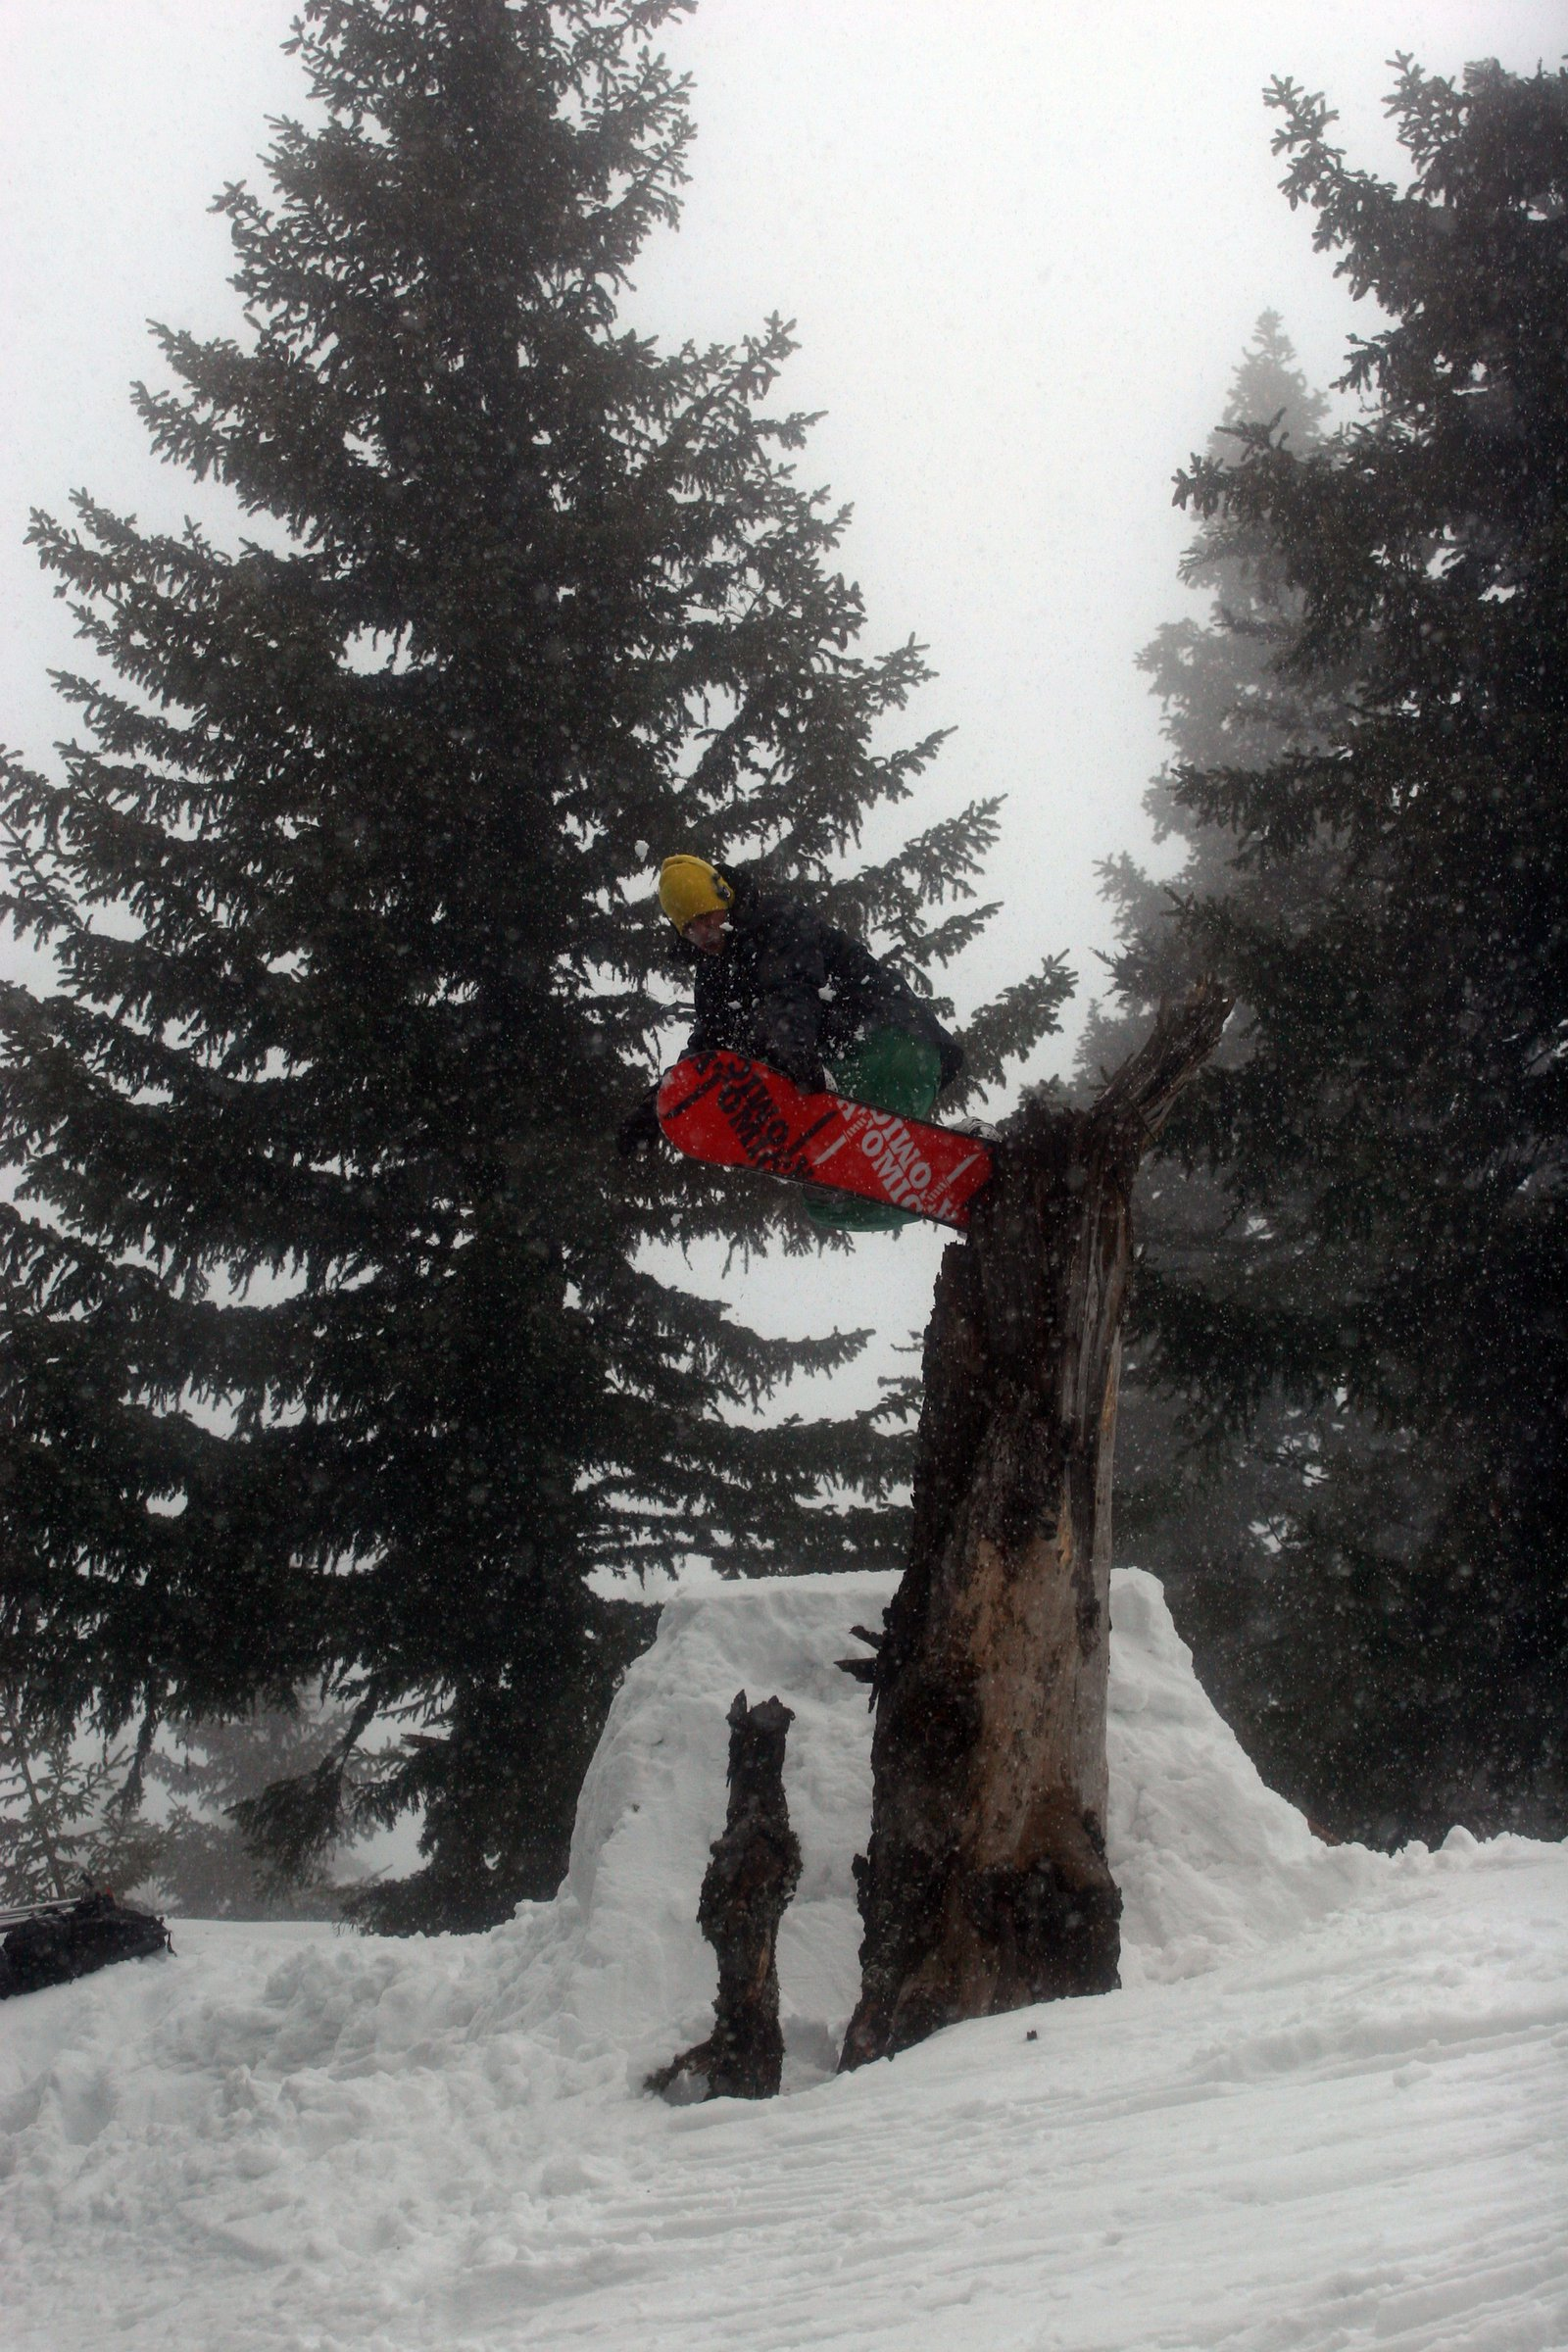 Snowboard treebonk #4